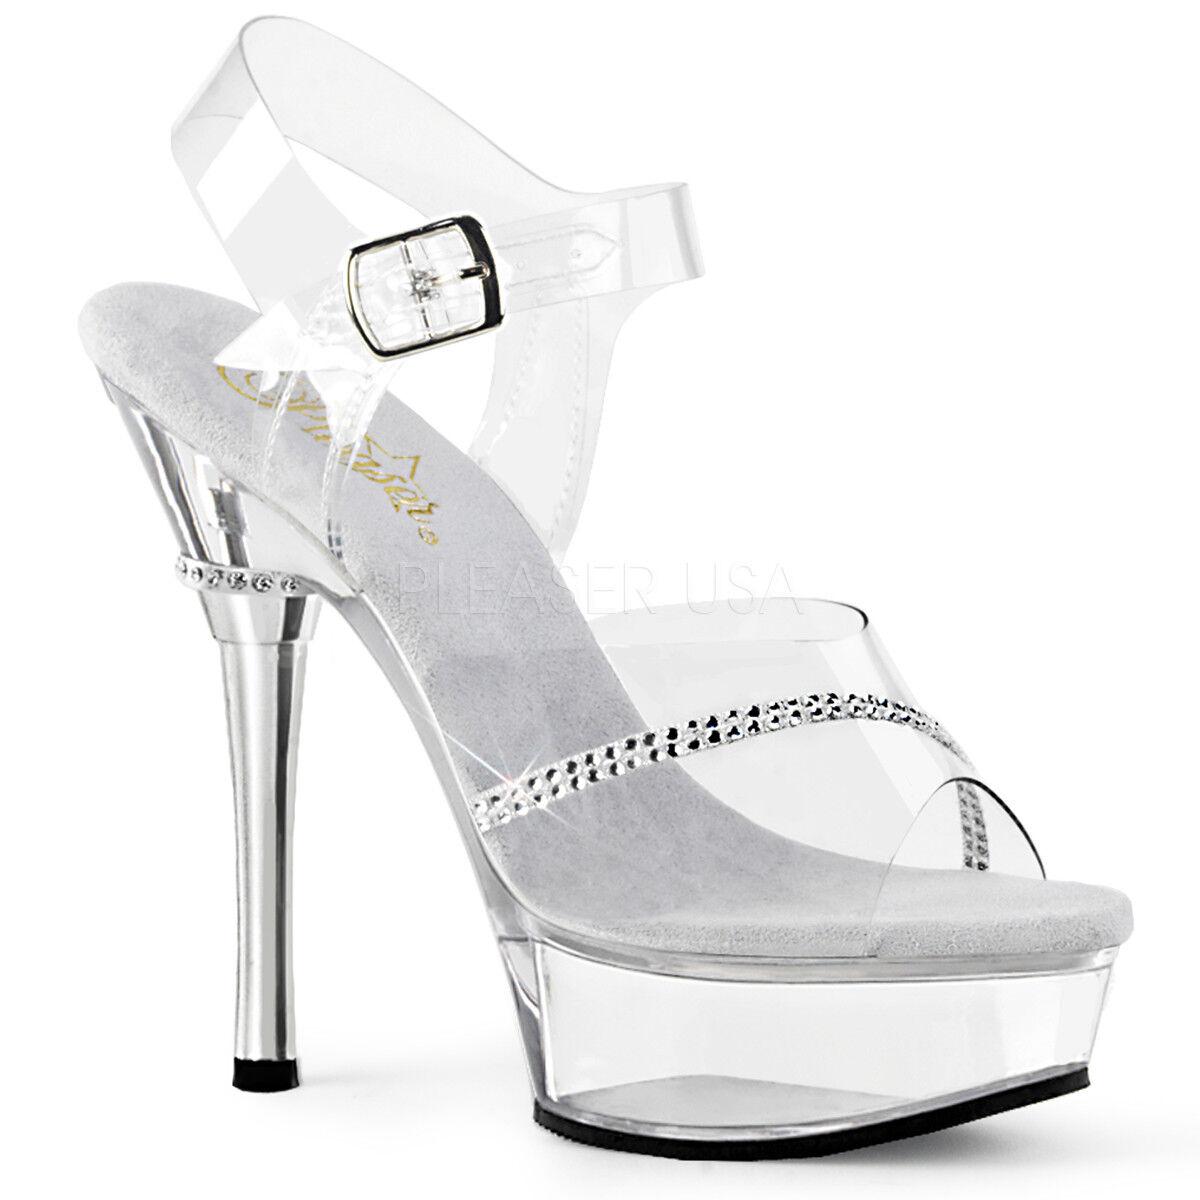 PLEASER - - - Allure-608R Sexy Heel Platform Ankle Strap Sandal Rhinestone 6dea63